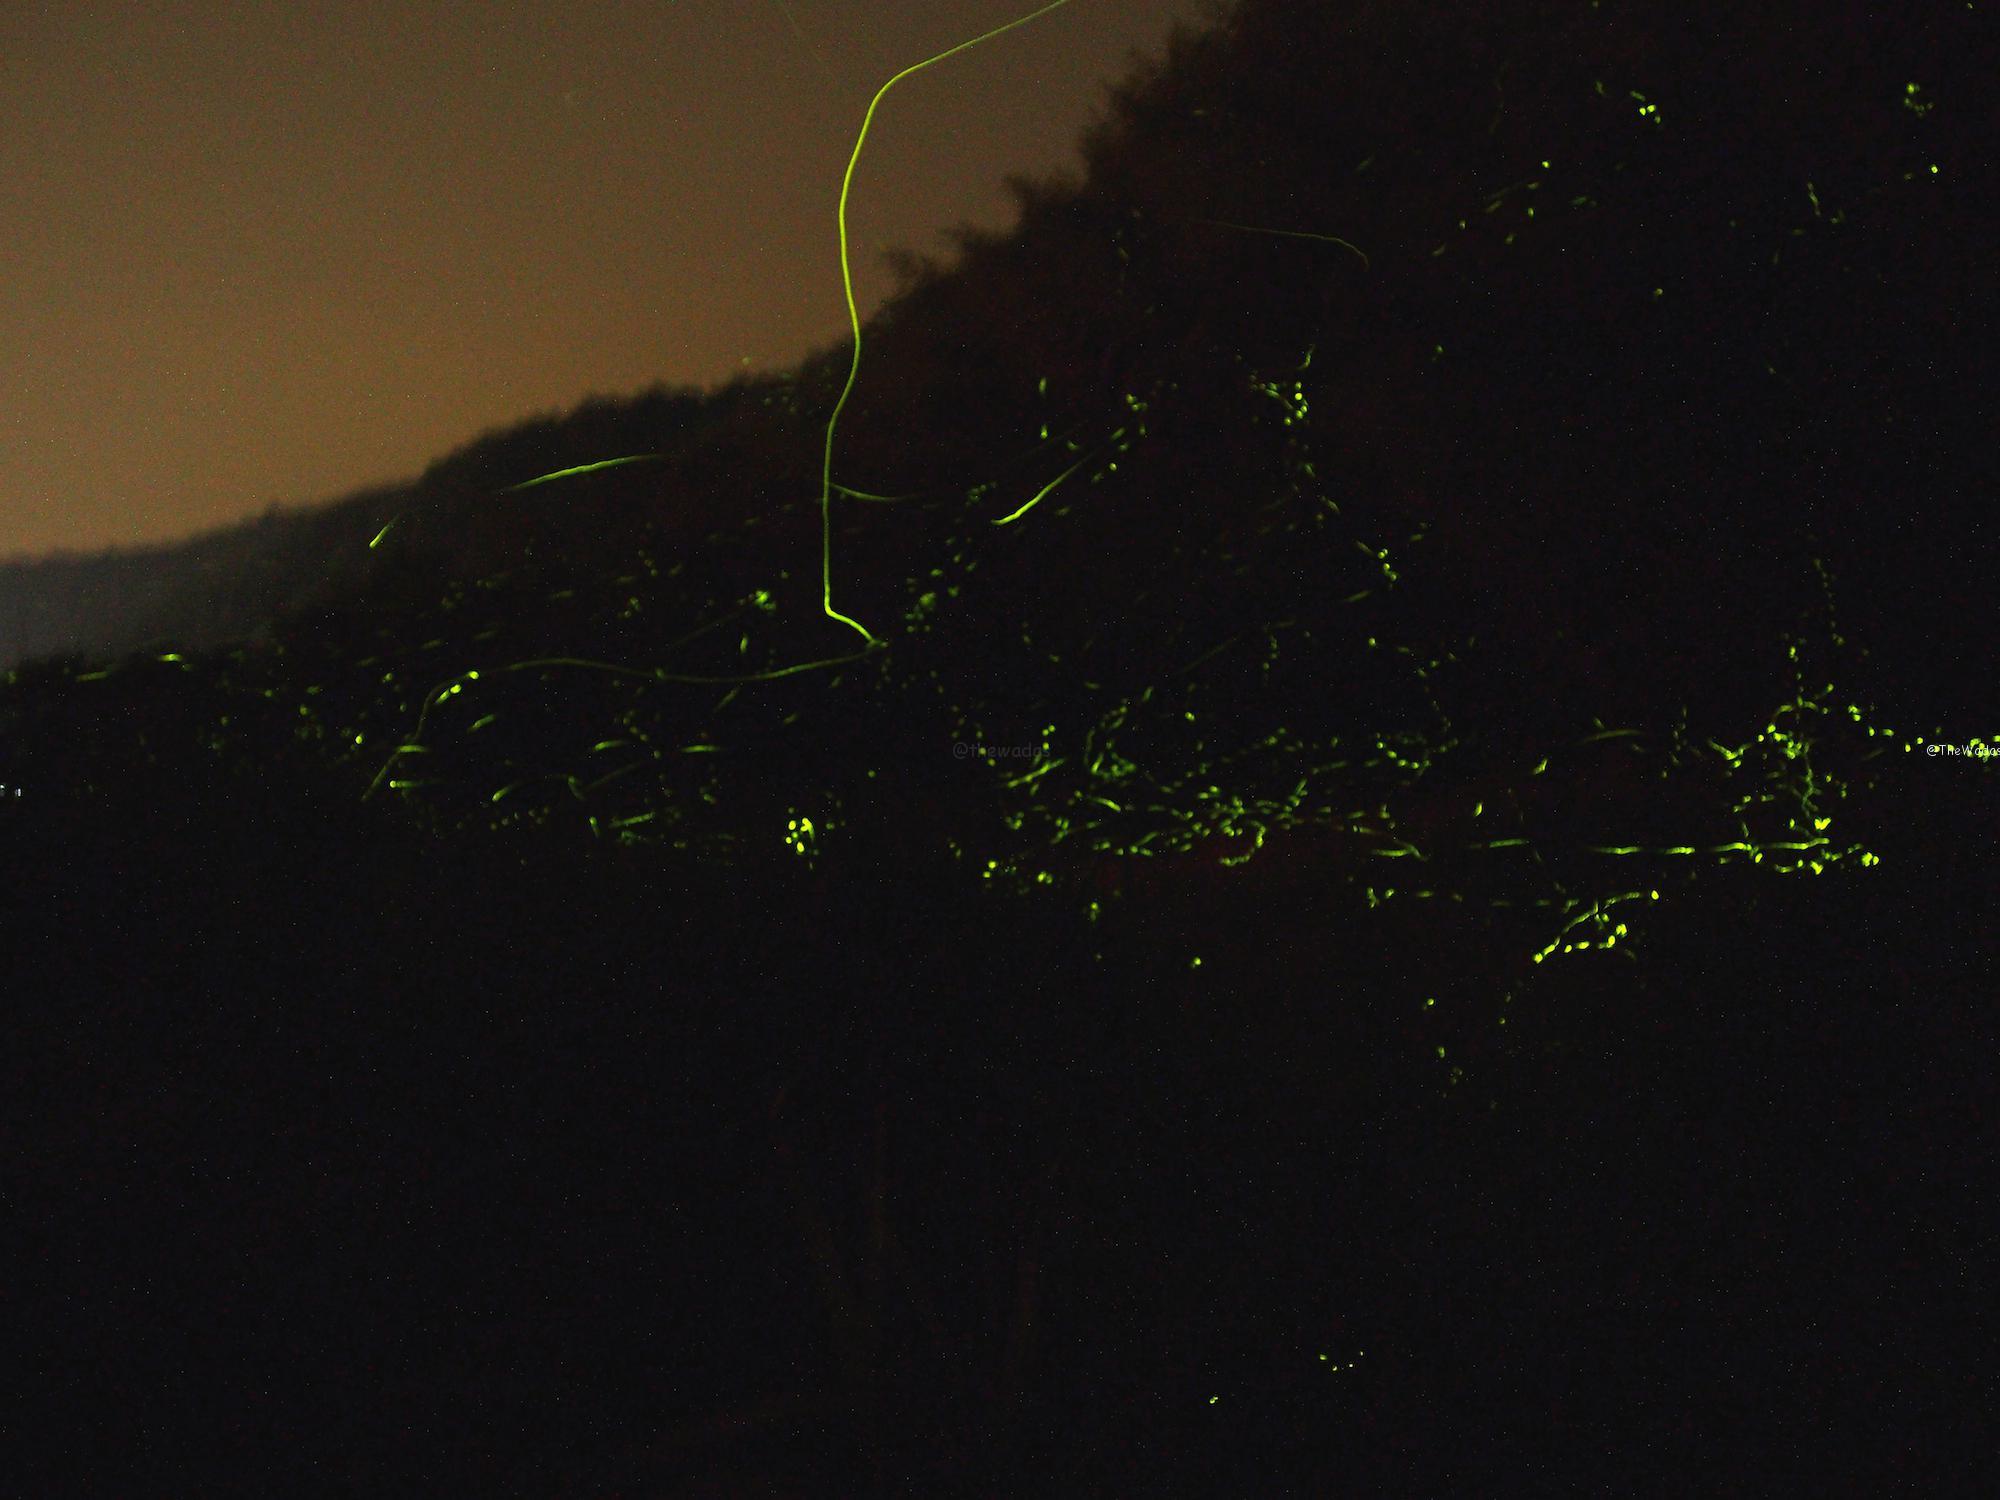 Japanese Fireflies in Hokubo, Maniwa City: Fireflies on the move